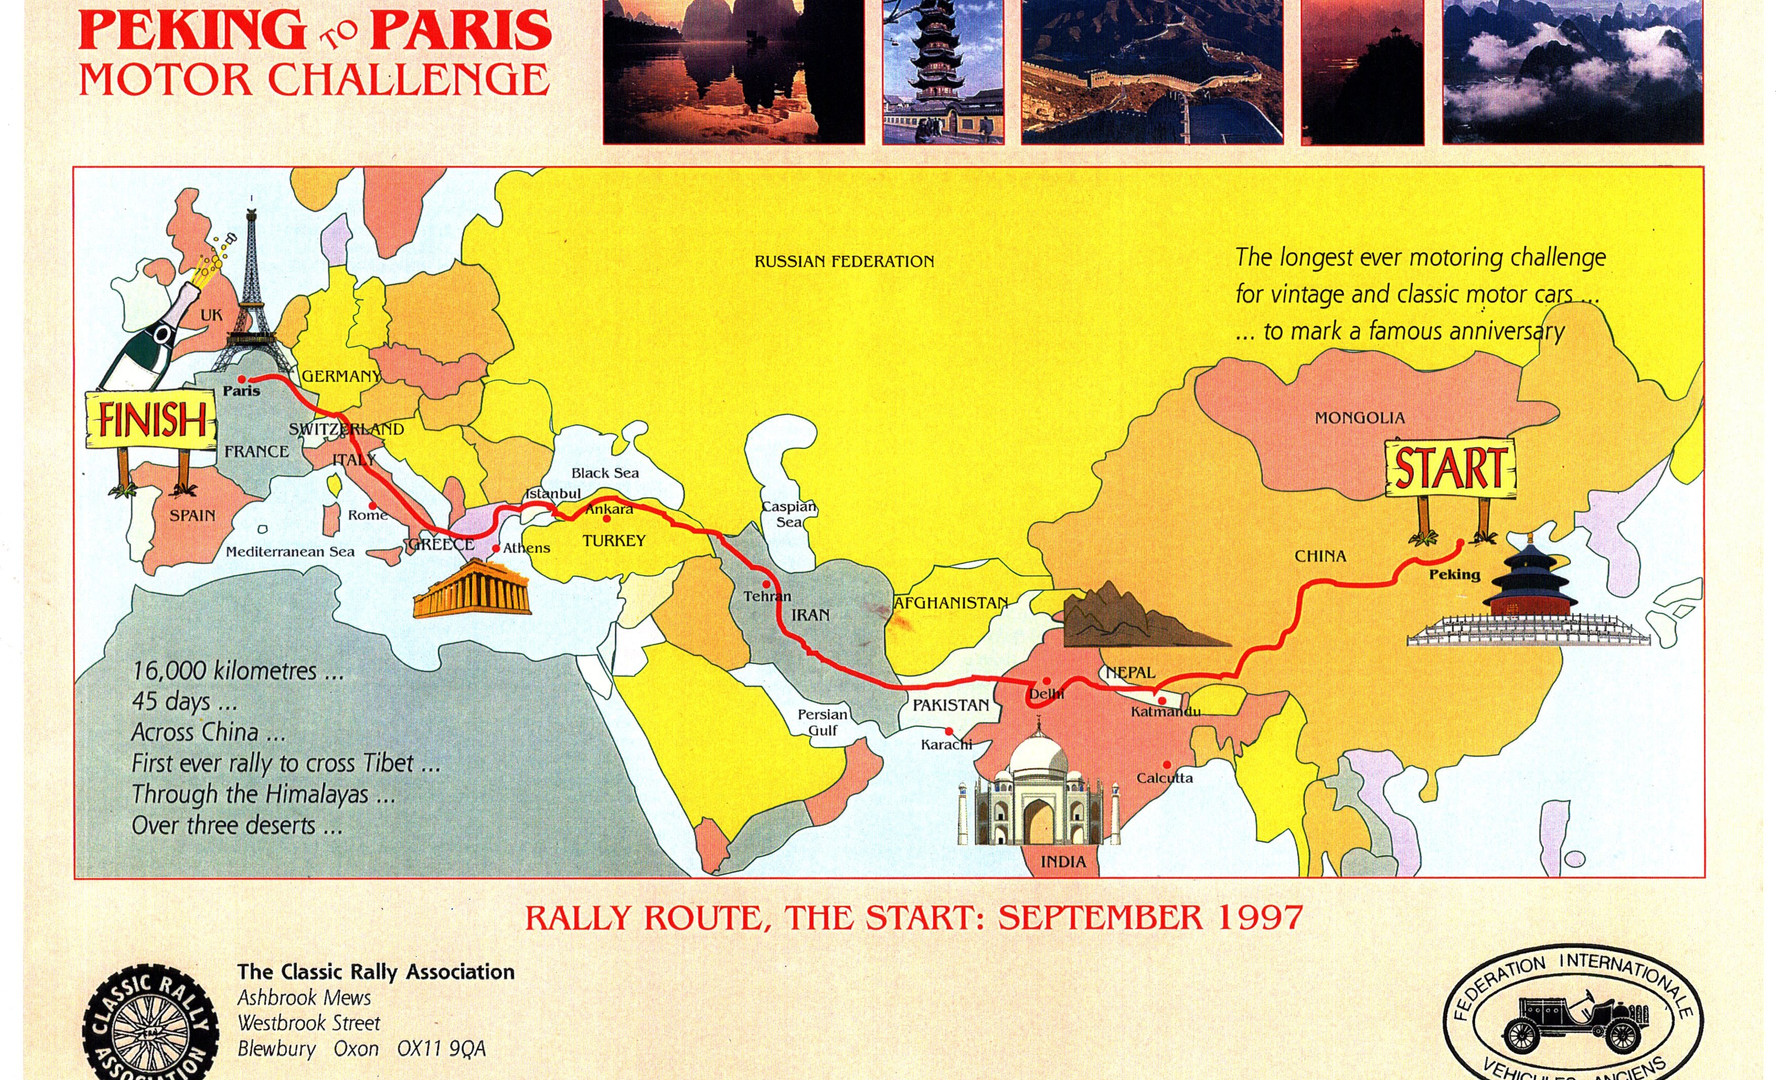 02 Peking to Paris, 1 route - 1997